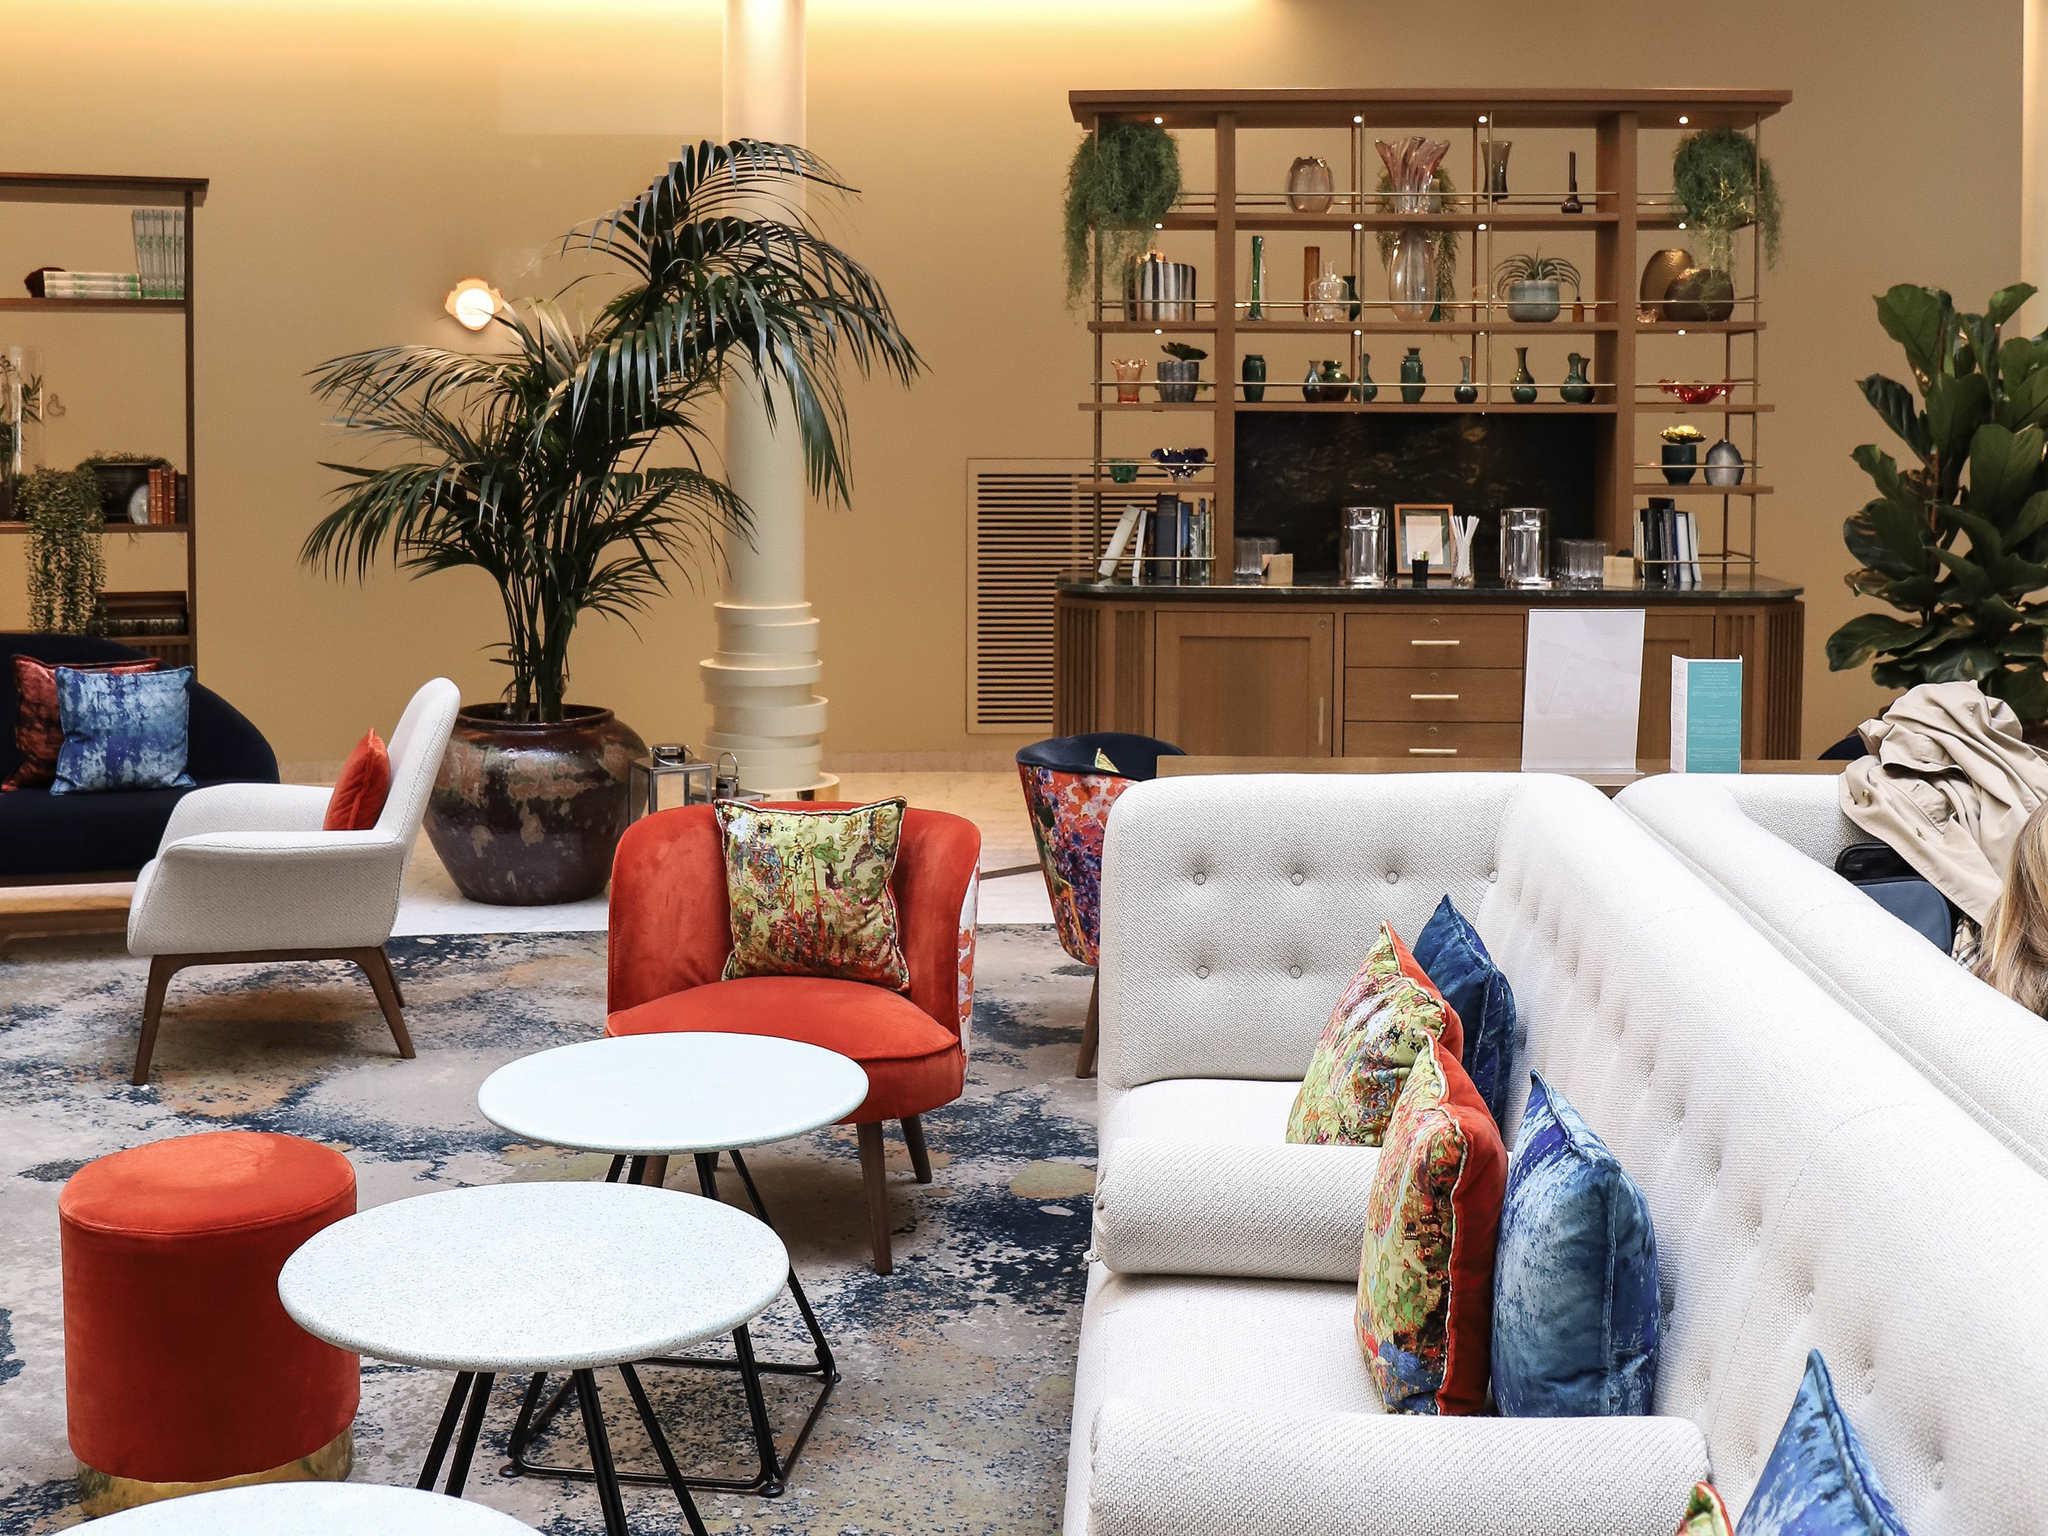 Hotel – Sofitel Brussels Europe